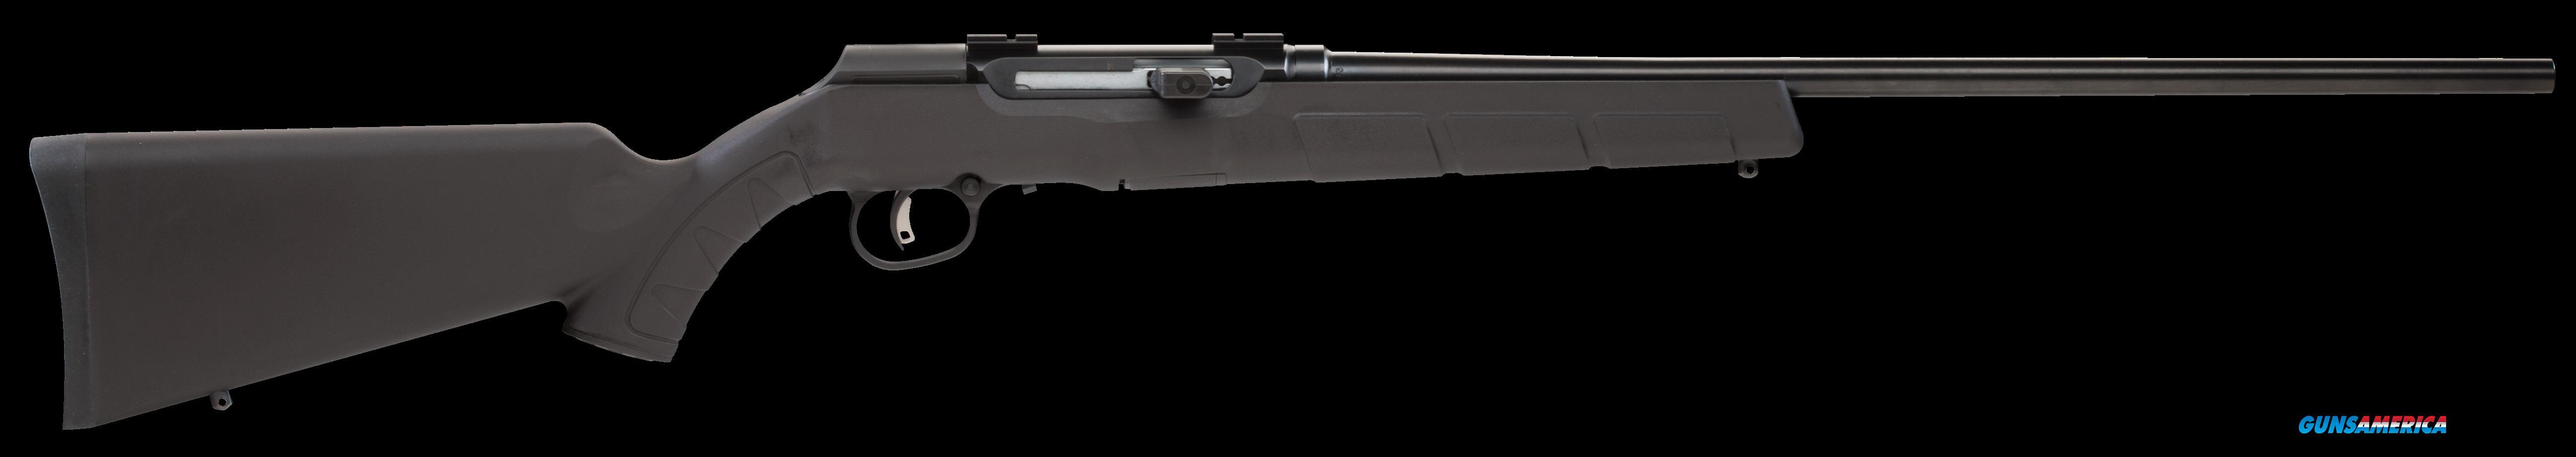 savage 47400 a22 magnum semi automatic 22 wmr 2 for sale